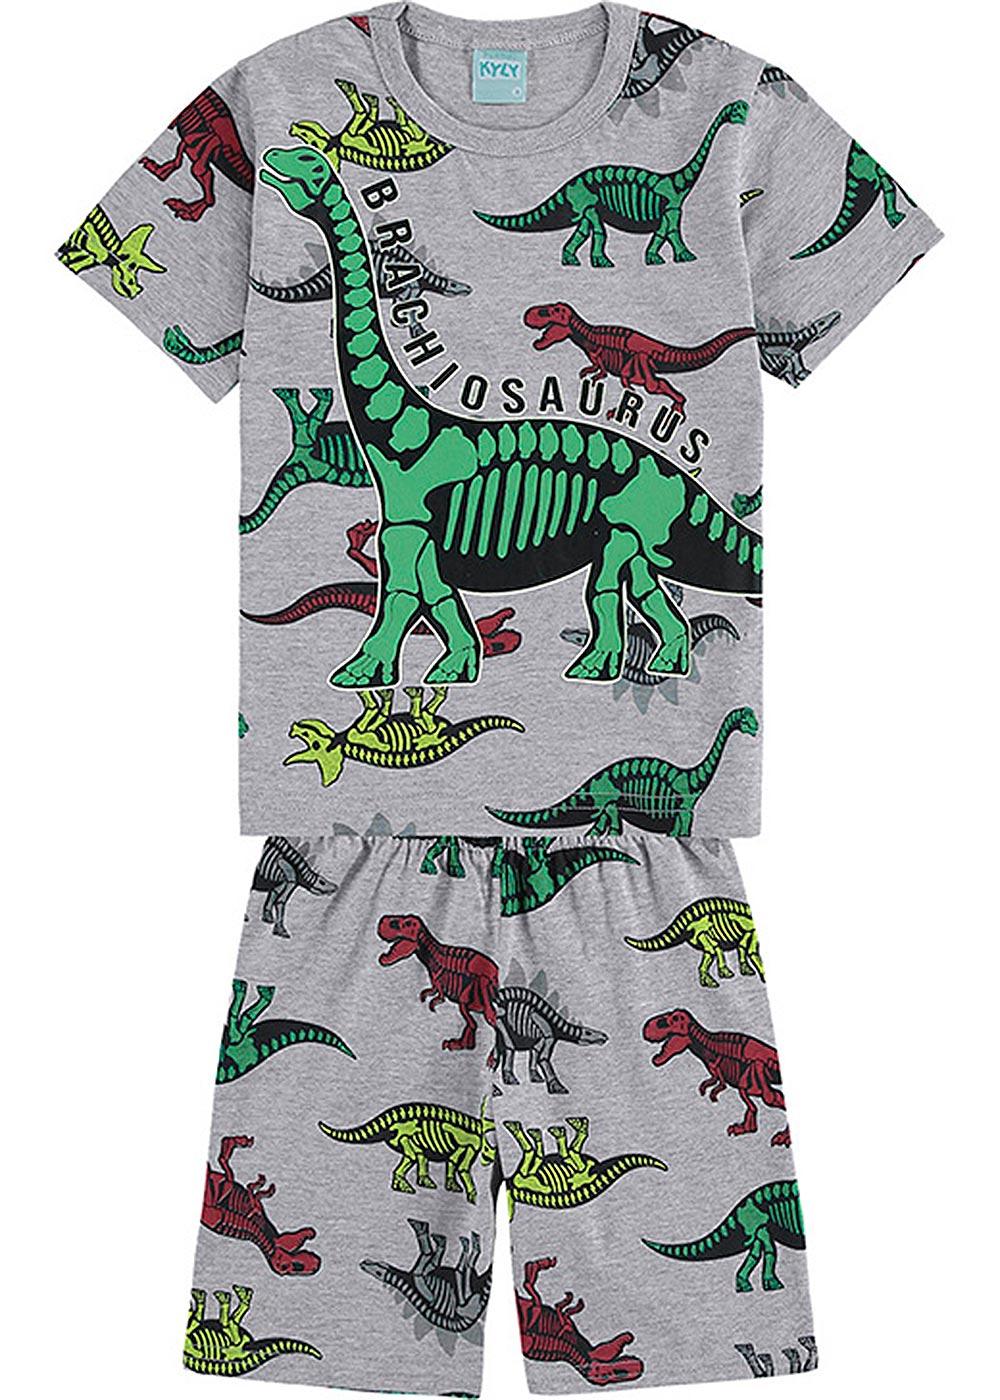 Pijama Infantil Masculino Verão Cinza Brachiosaurus - Kyly